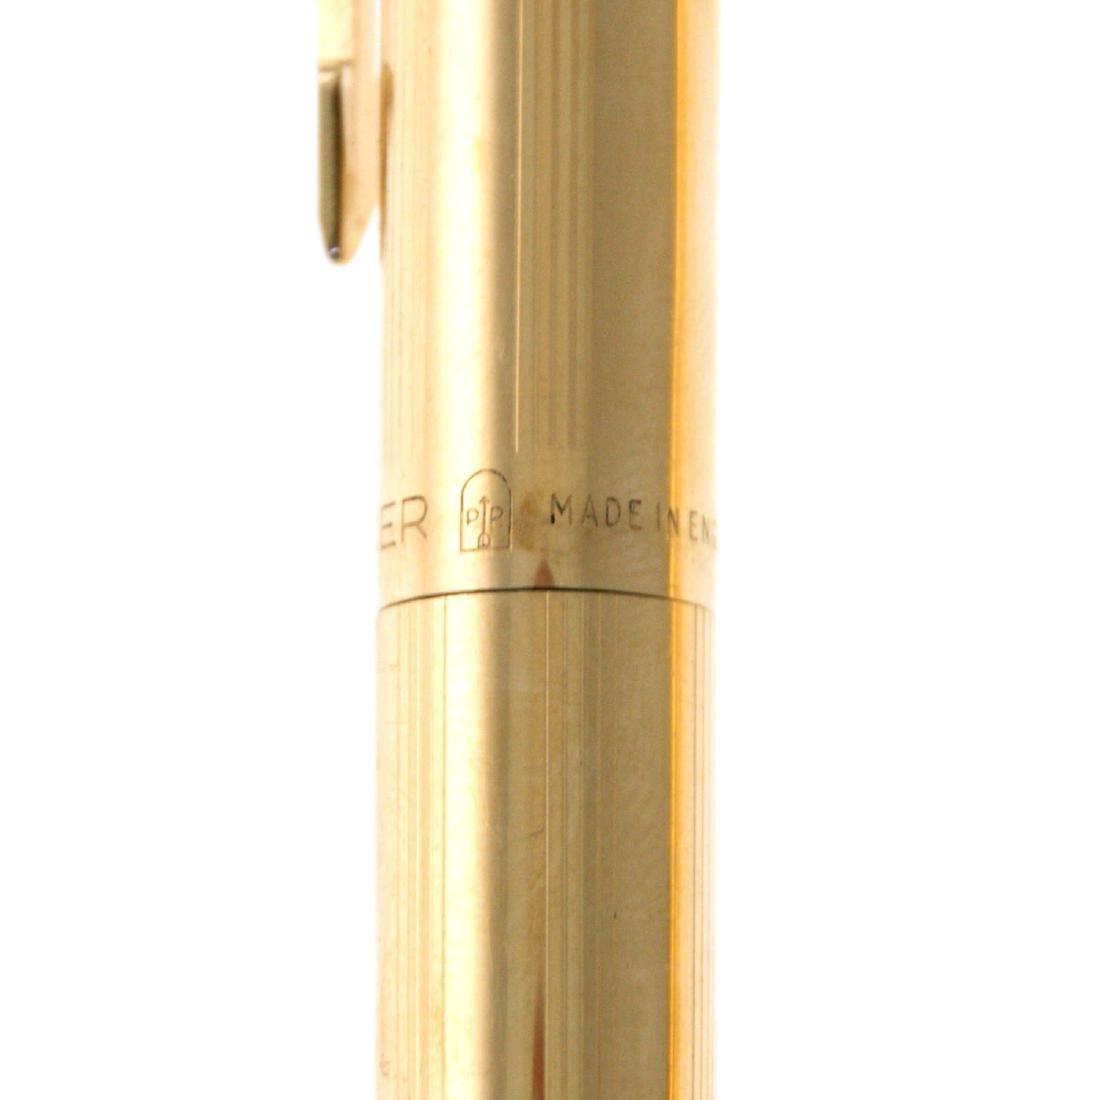 Parker Fountain Pen and Ballpoint Pen. - 4